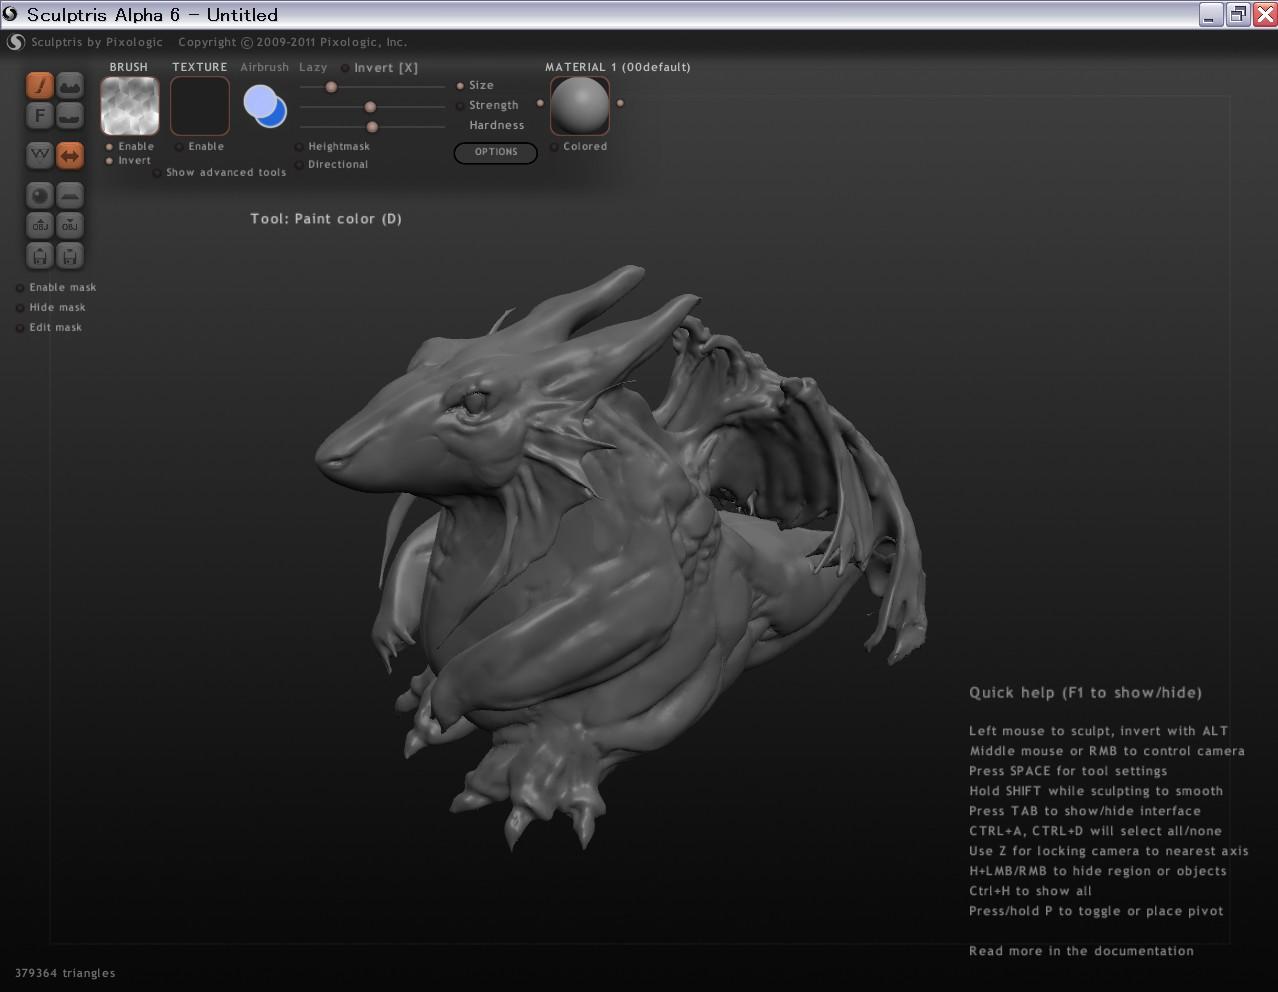 【3DCG】Sculptrisで作った自分